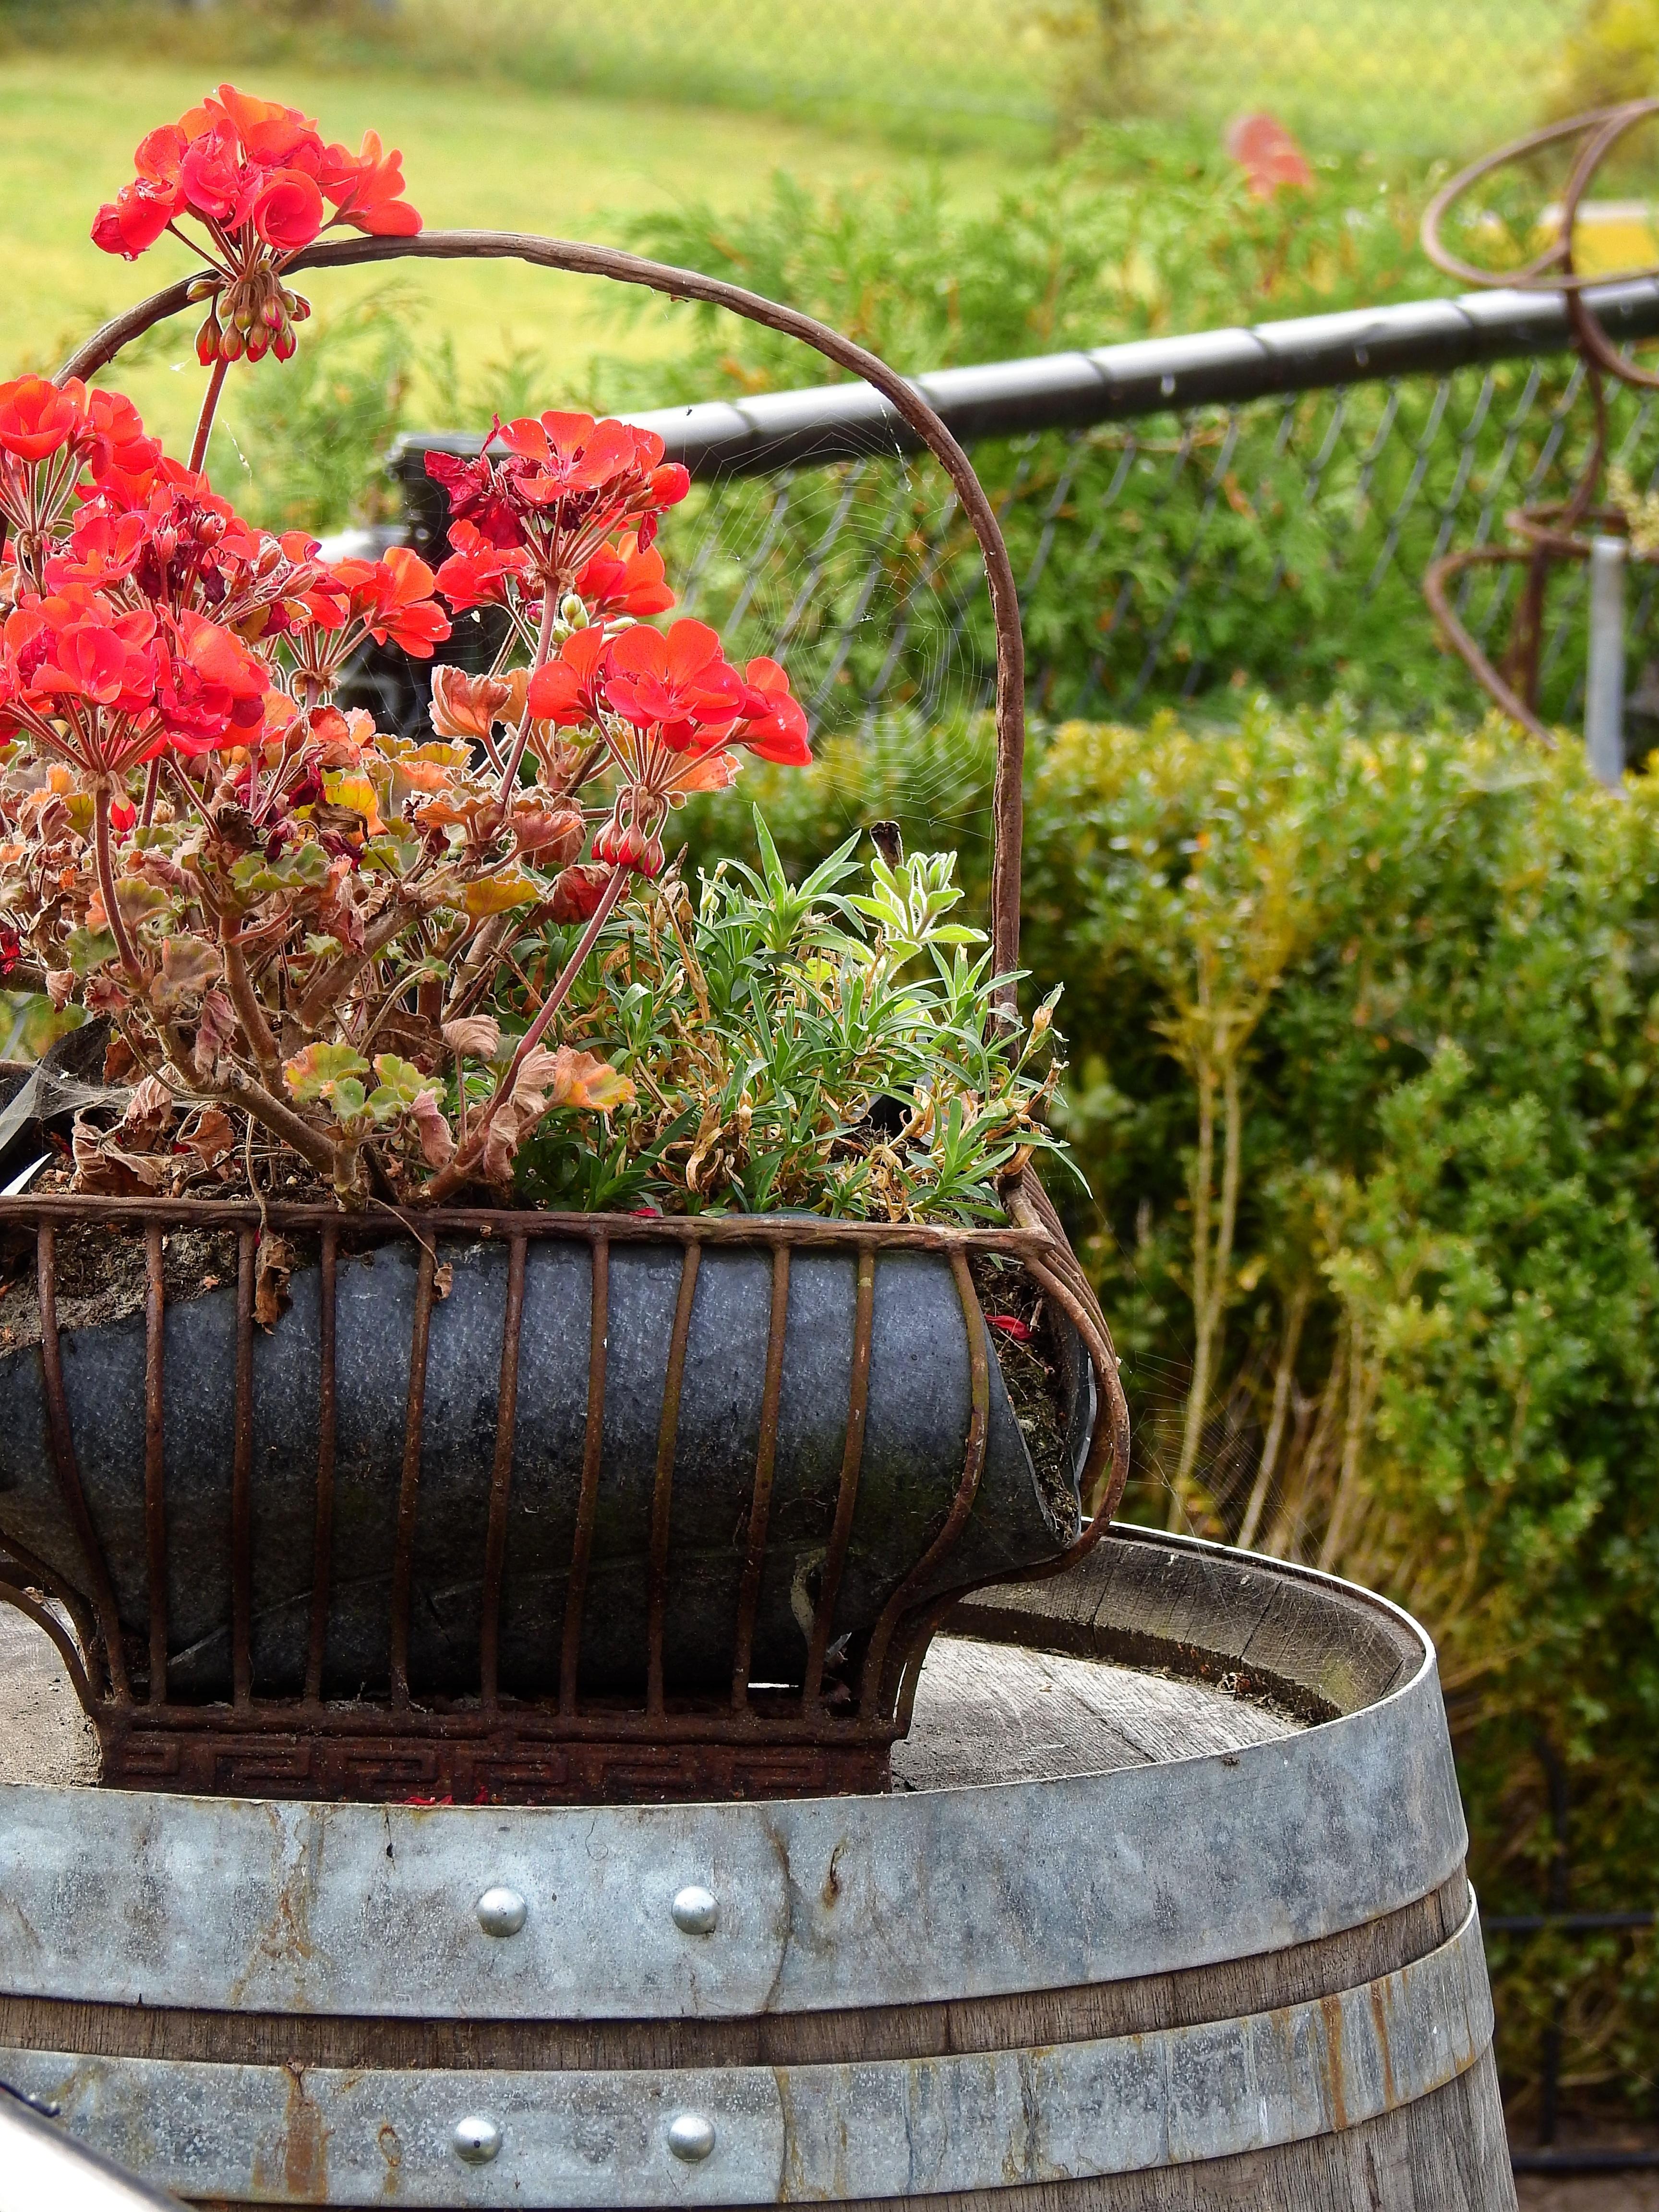 Fotos gratis flor planta c sped florecer decoraci n for Jardin al aire libre de madera deco